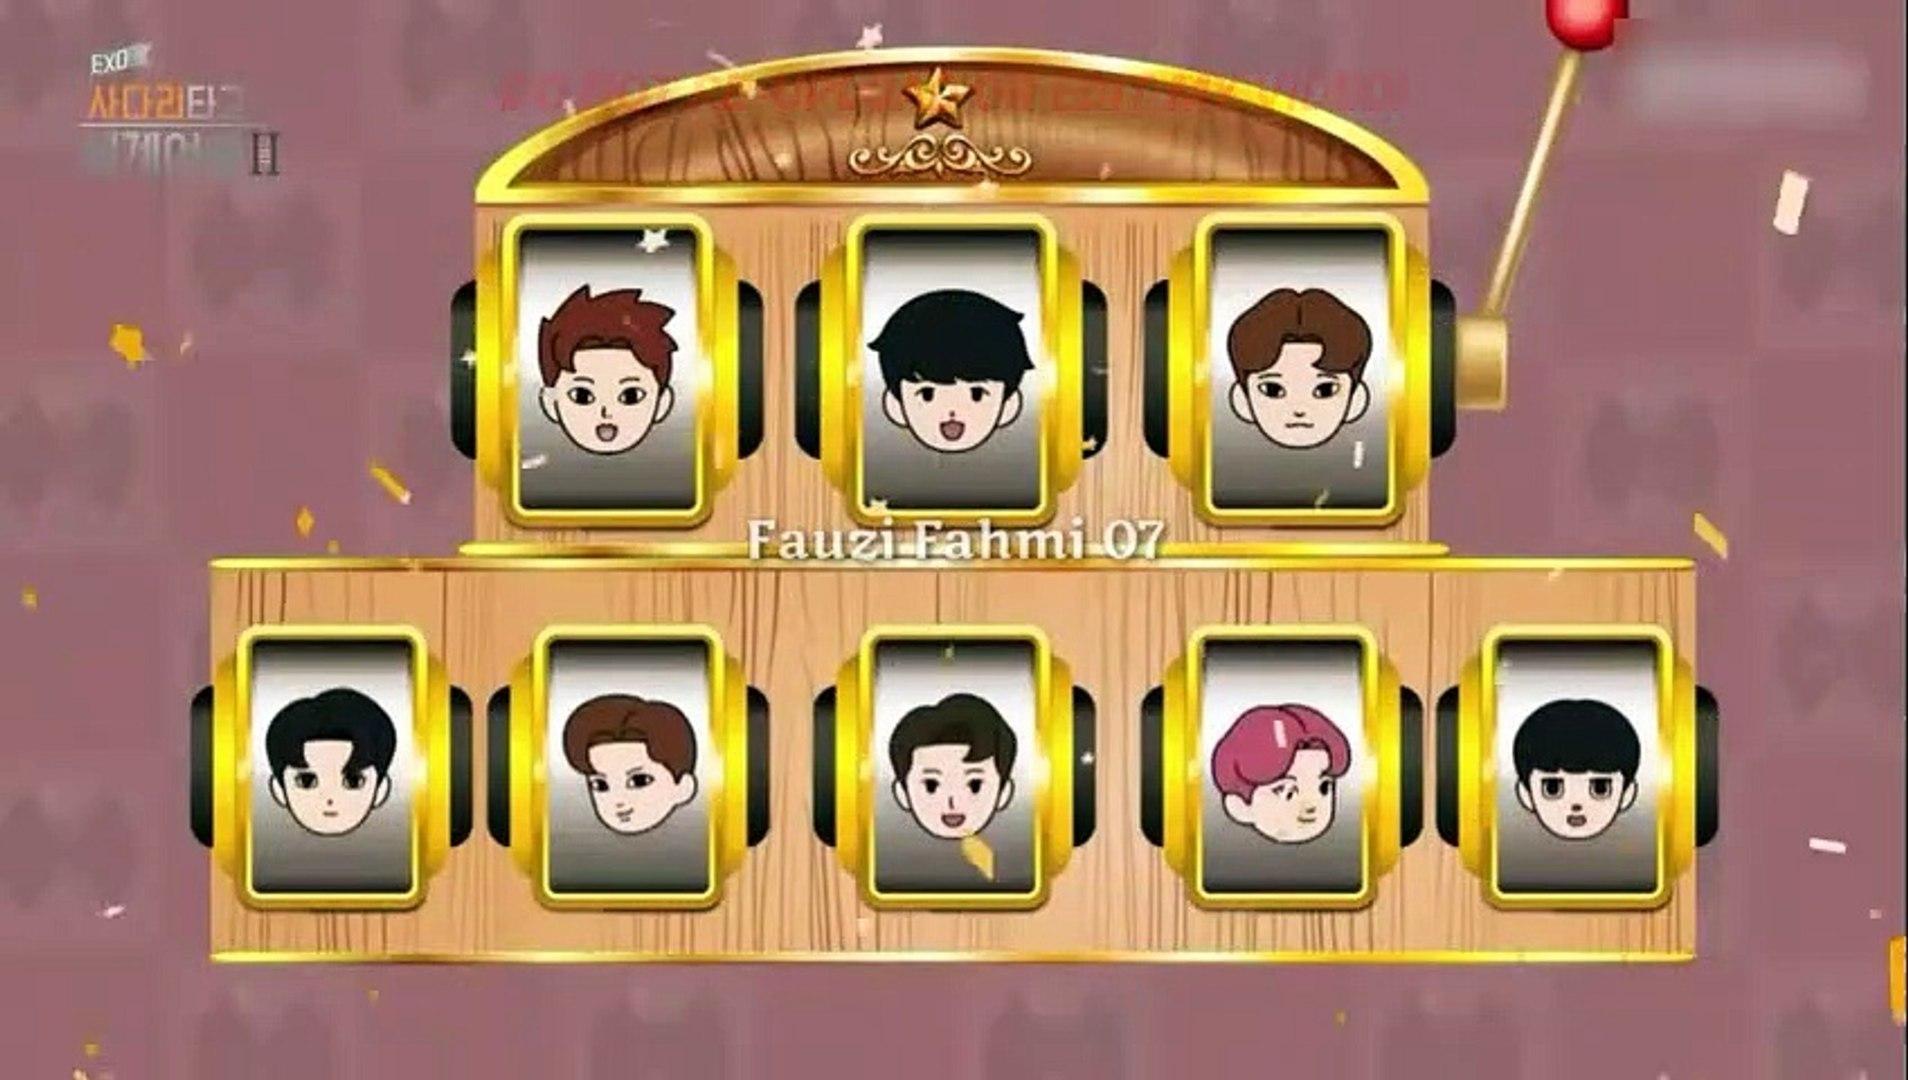 Top Five Exo Travel The World Season 2 Ep 1 English Sub - Circus